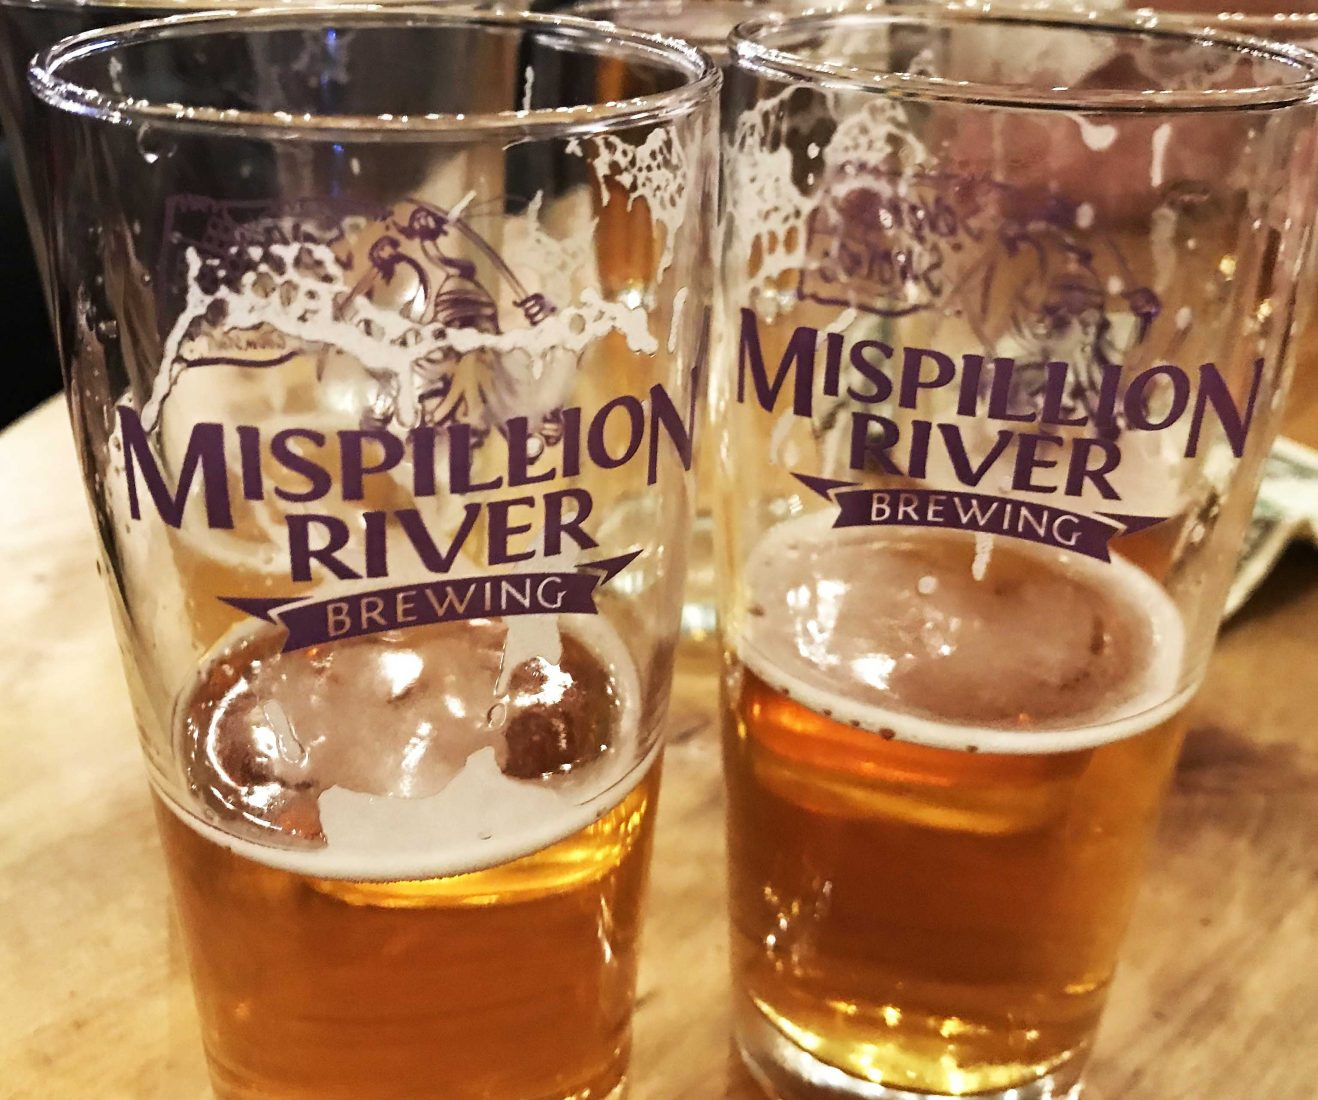 402. Mispillion River Brewing, Milford DE, 2018